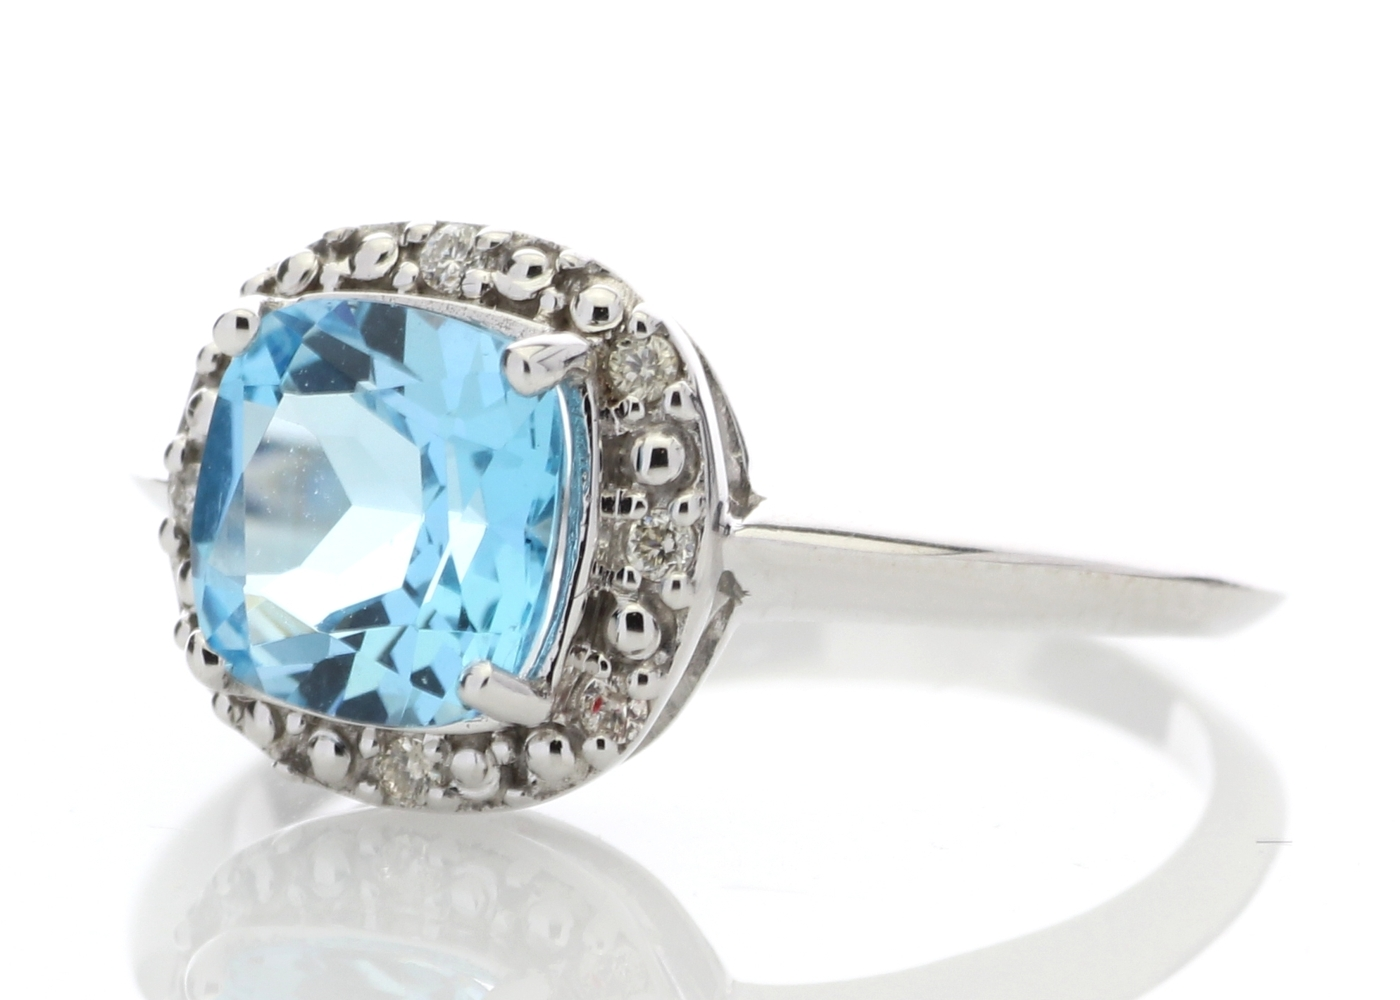 diamant kissen schnitt blauer topas halo satz 9 karat. Black Bedroom Furniture Sets. Home Design Ideas